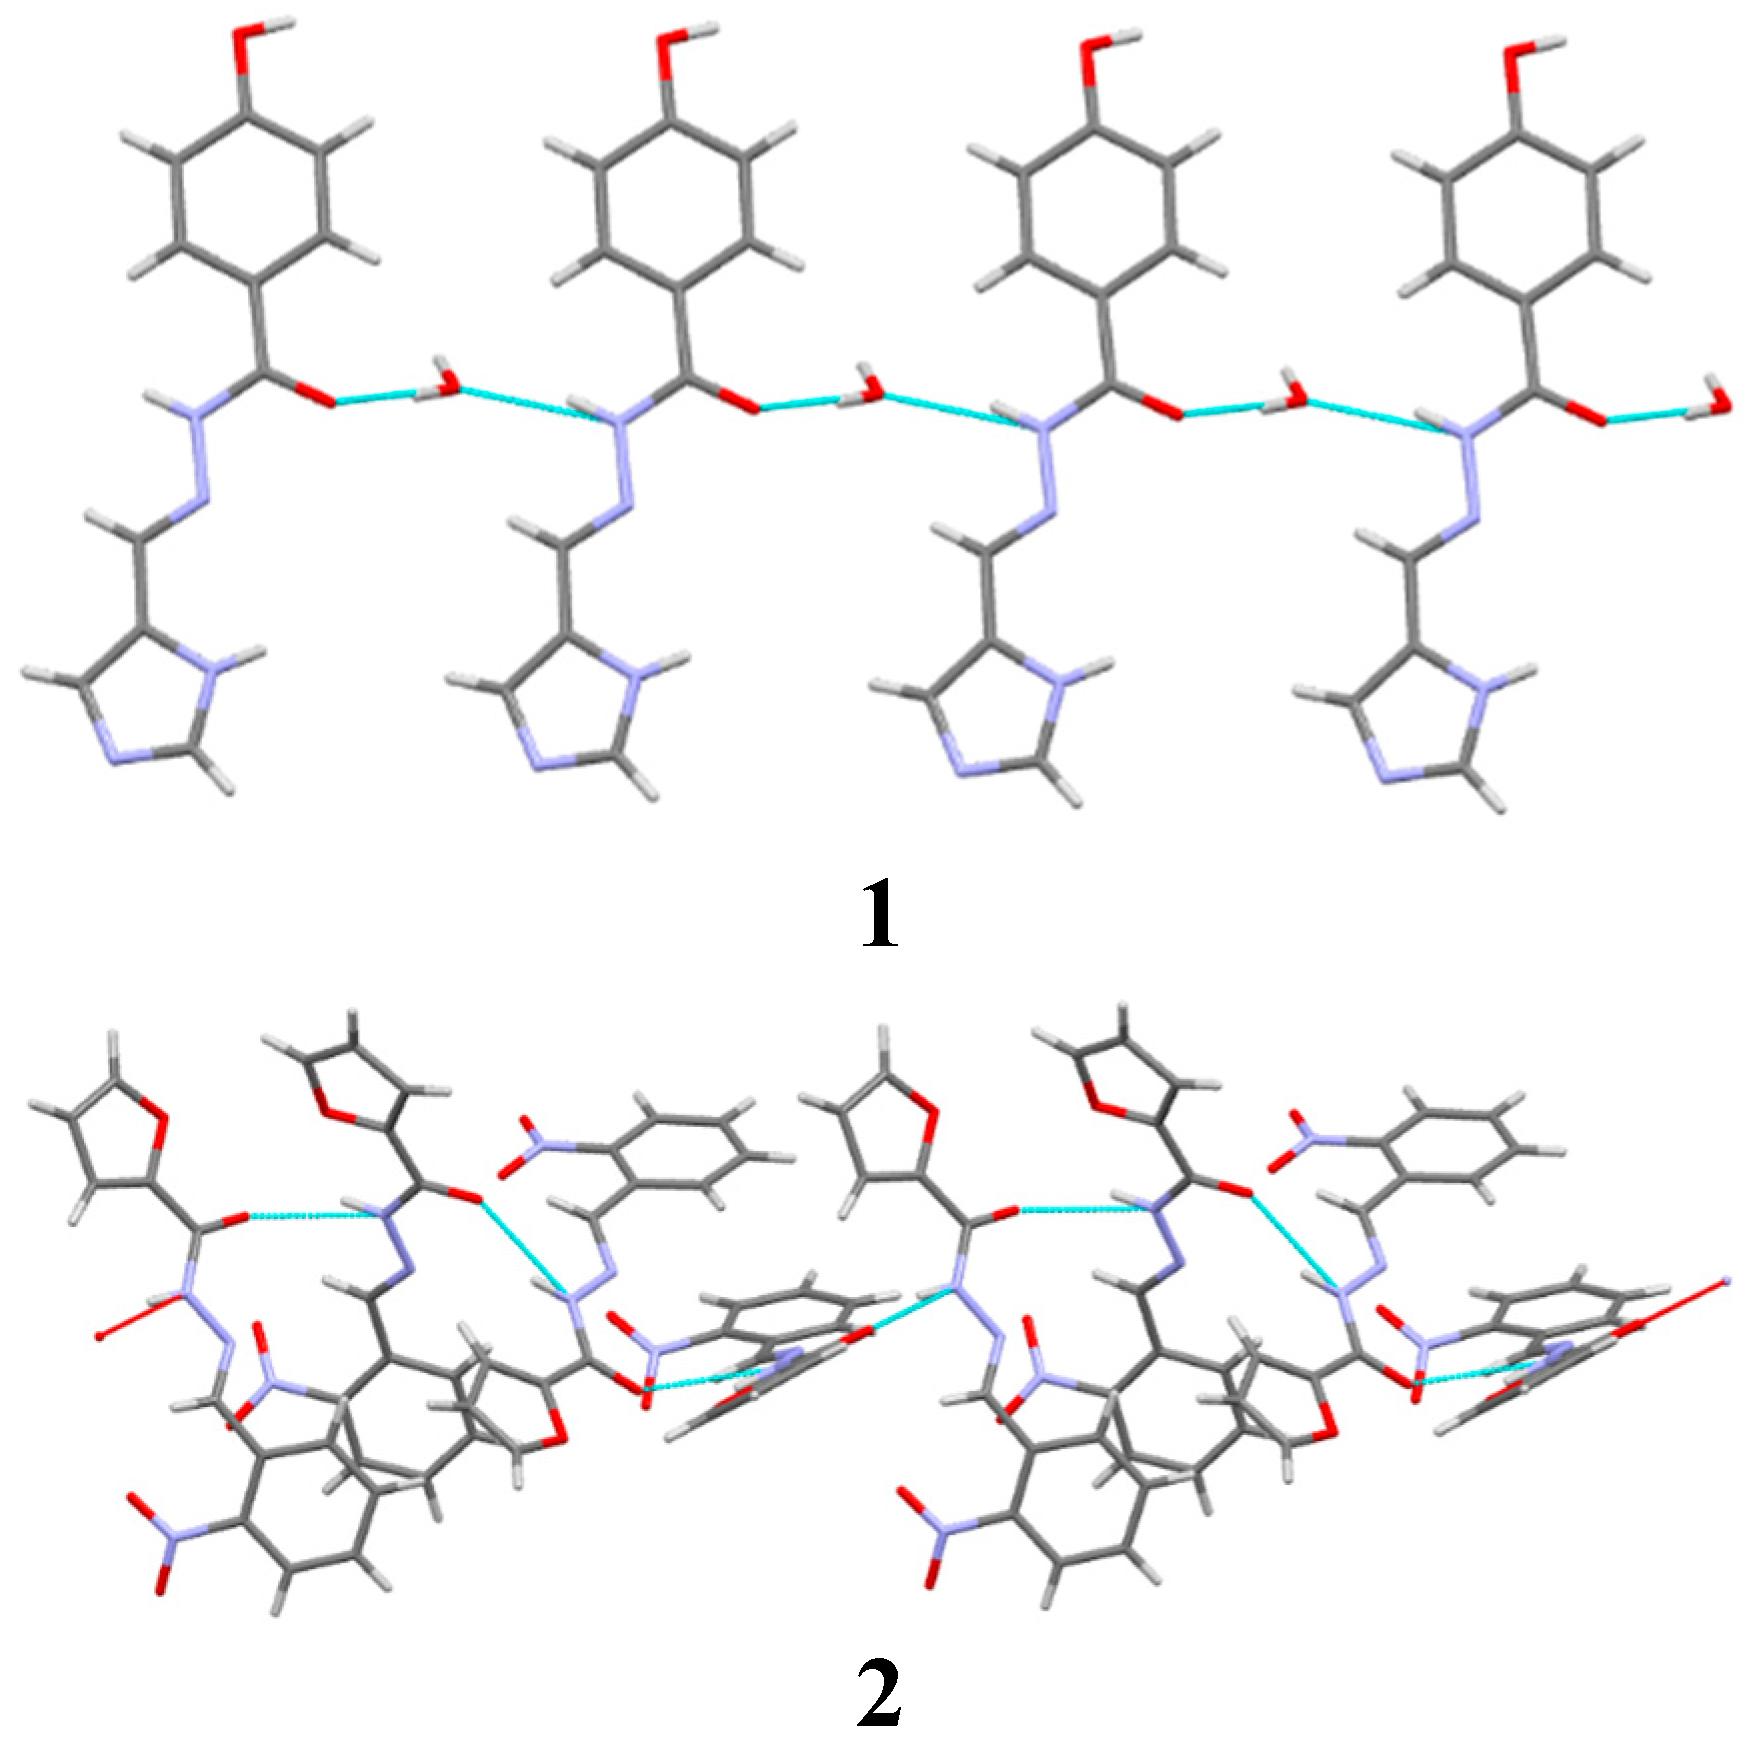 2-Pyrrolidone (2-Pyrol™ solvent)